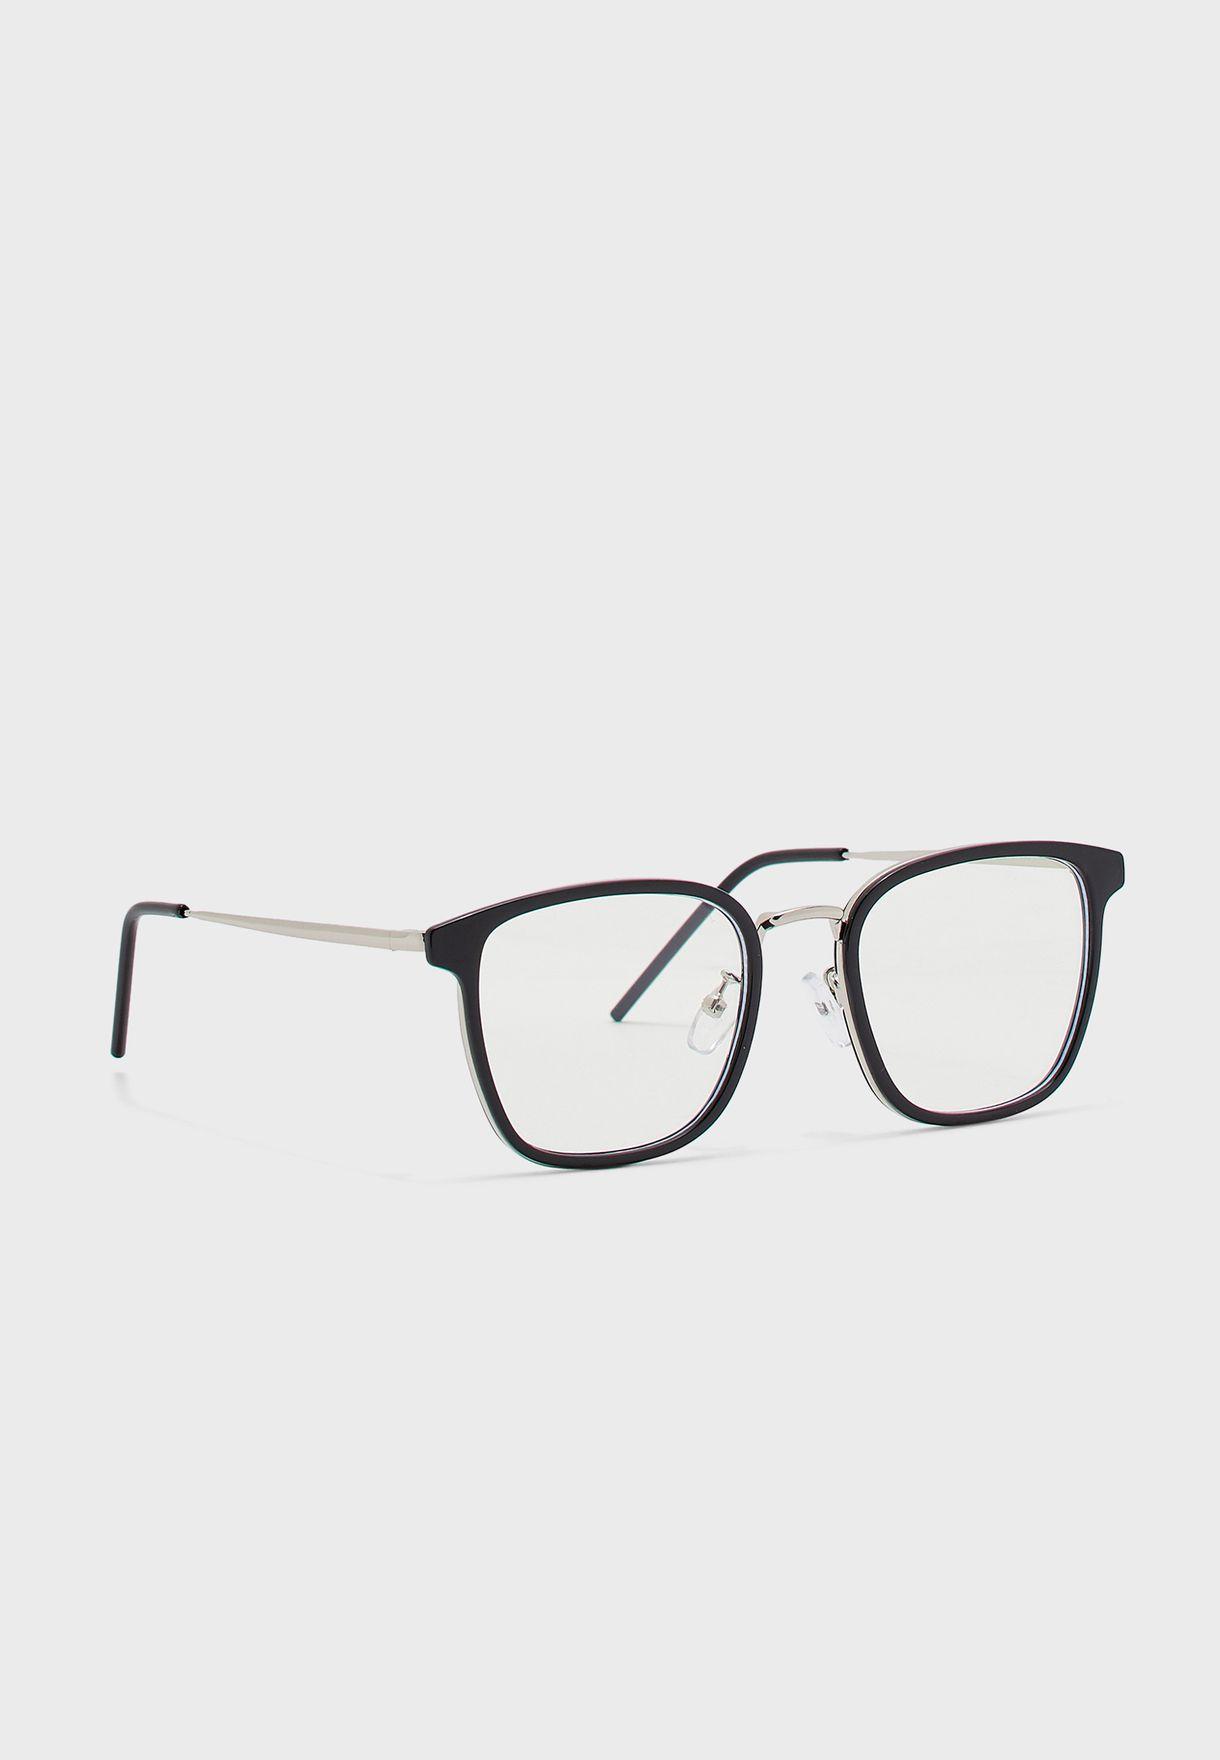 Clear Optical Lens Glasses